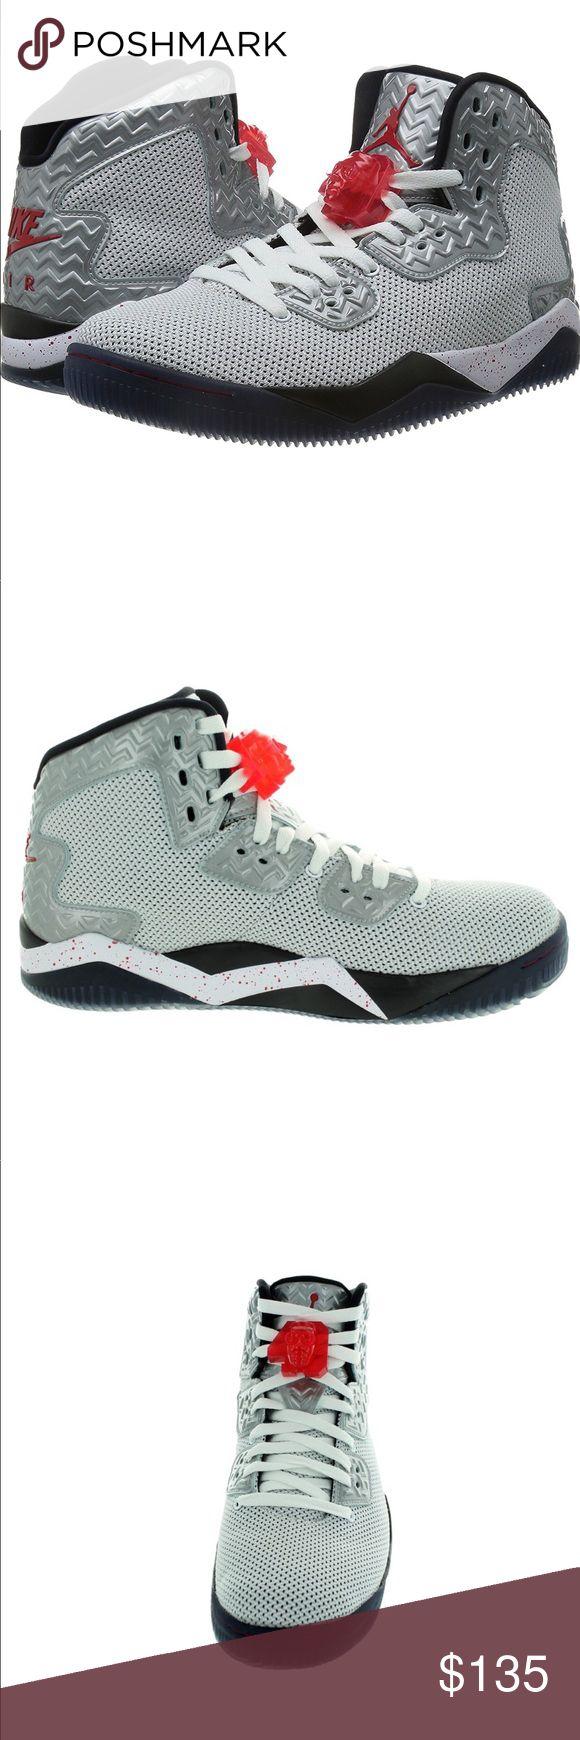 🆕 Nike Air Jordan Spike 40 PE NIB Another release by Spike Lee with the Jordan Nike brand! Comes in original box. Never worn Nike Shoes Sneakers